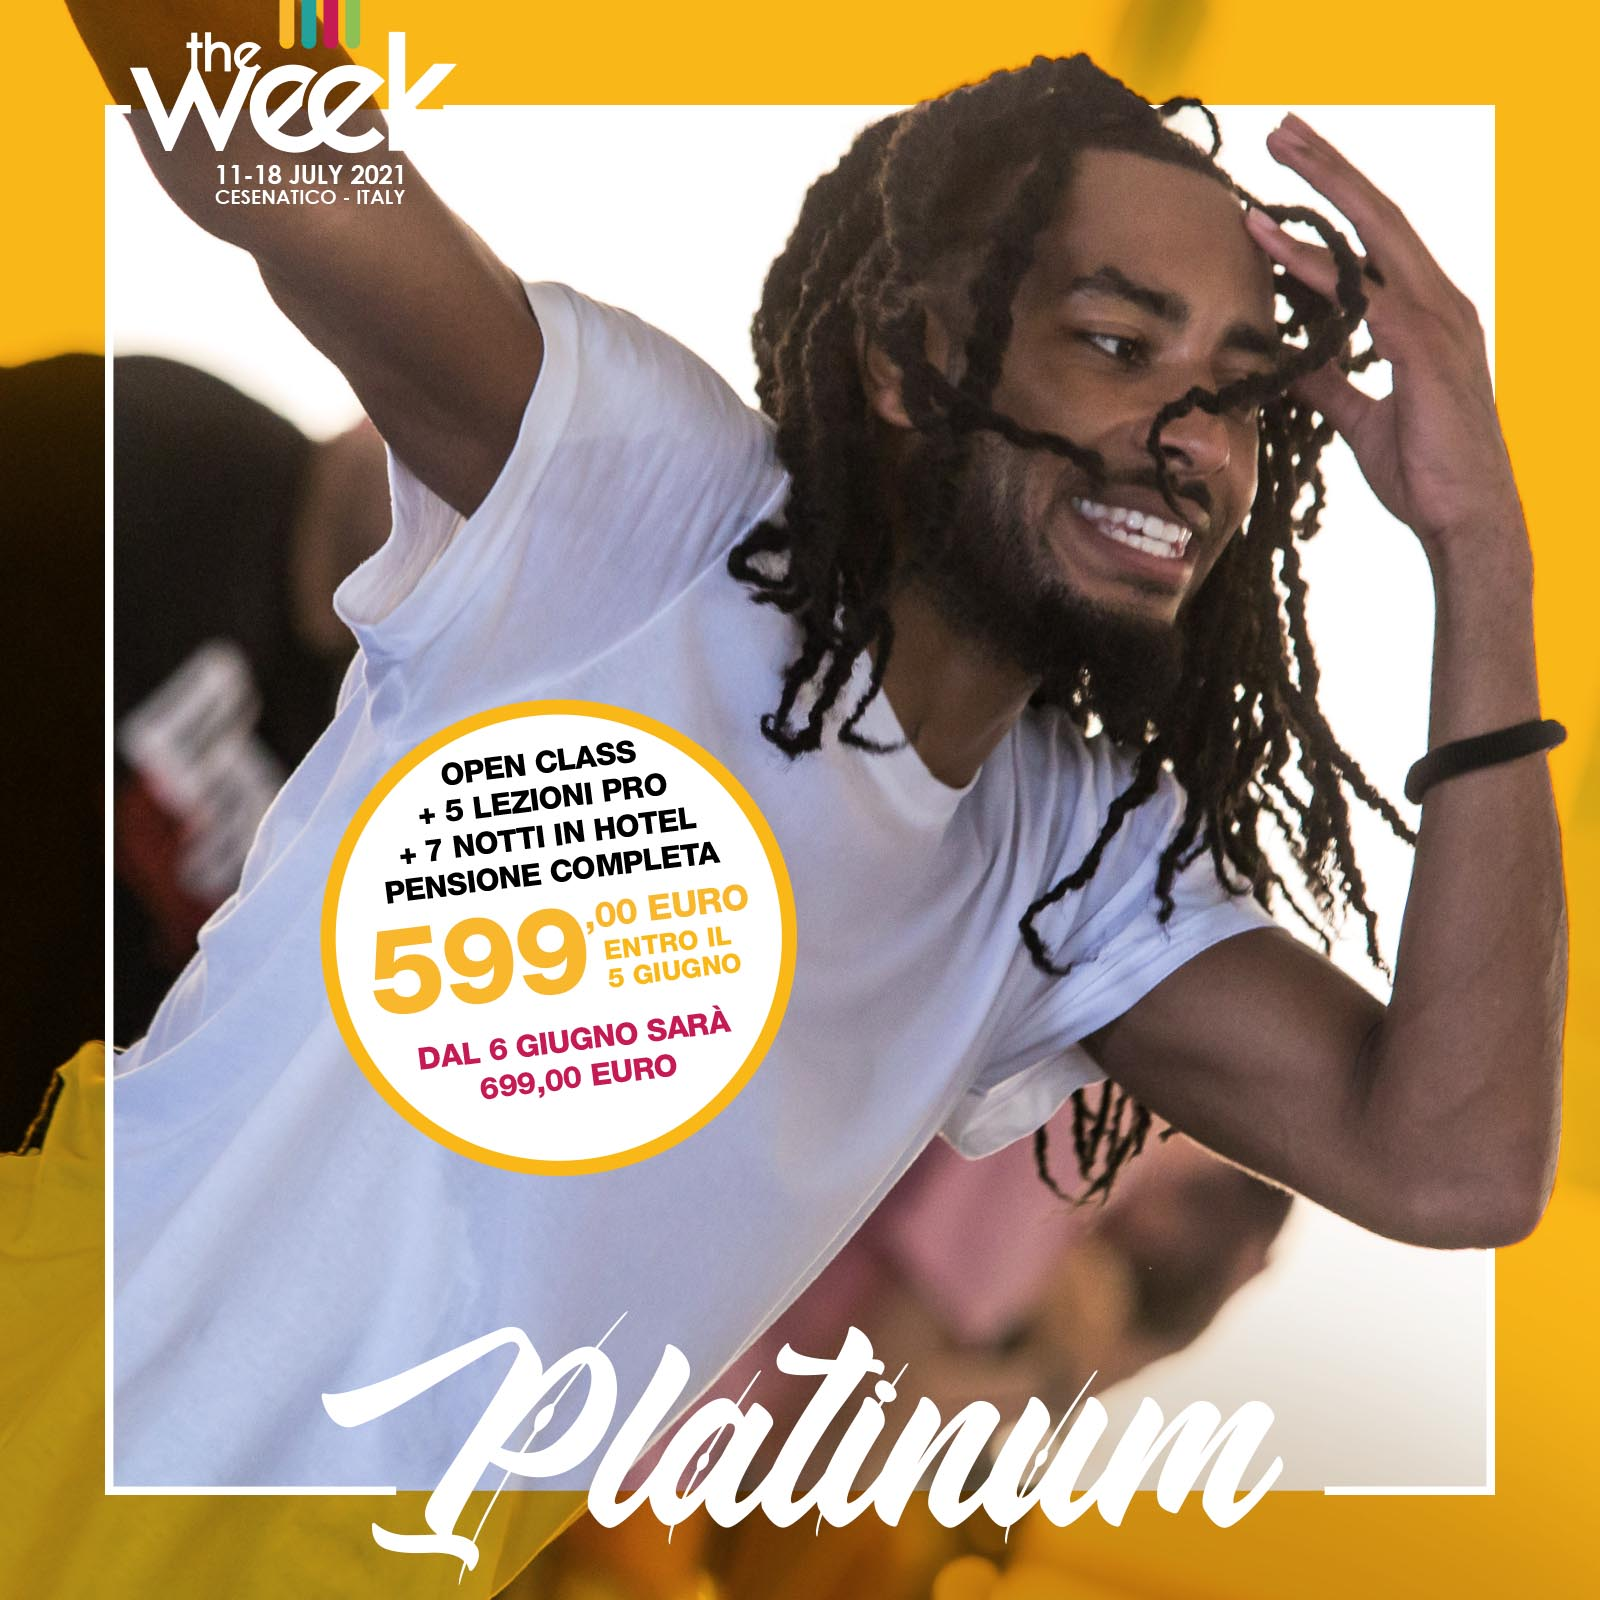 Platinum Card The Week The WeeKidz Street Dance Summer Camp Cesenatico Italy Workshop Stage Hip Hop Festival